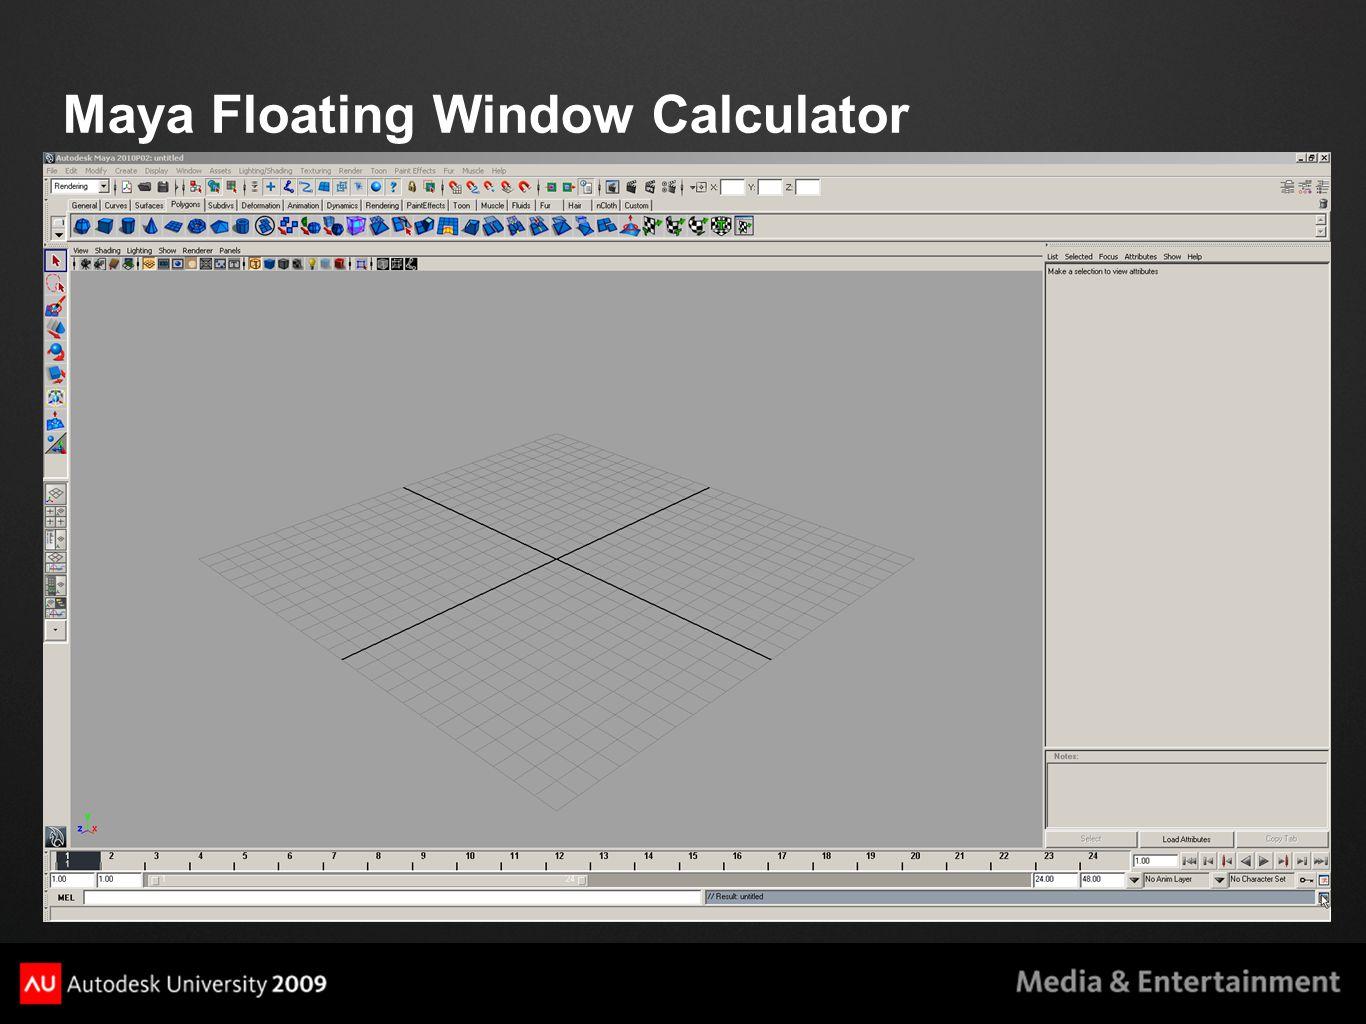 Maya Floating Window Calculator DEMO